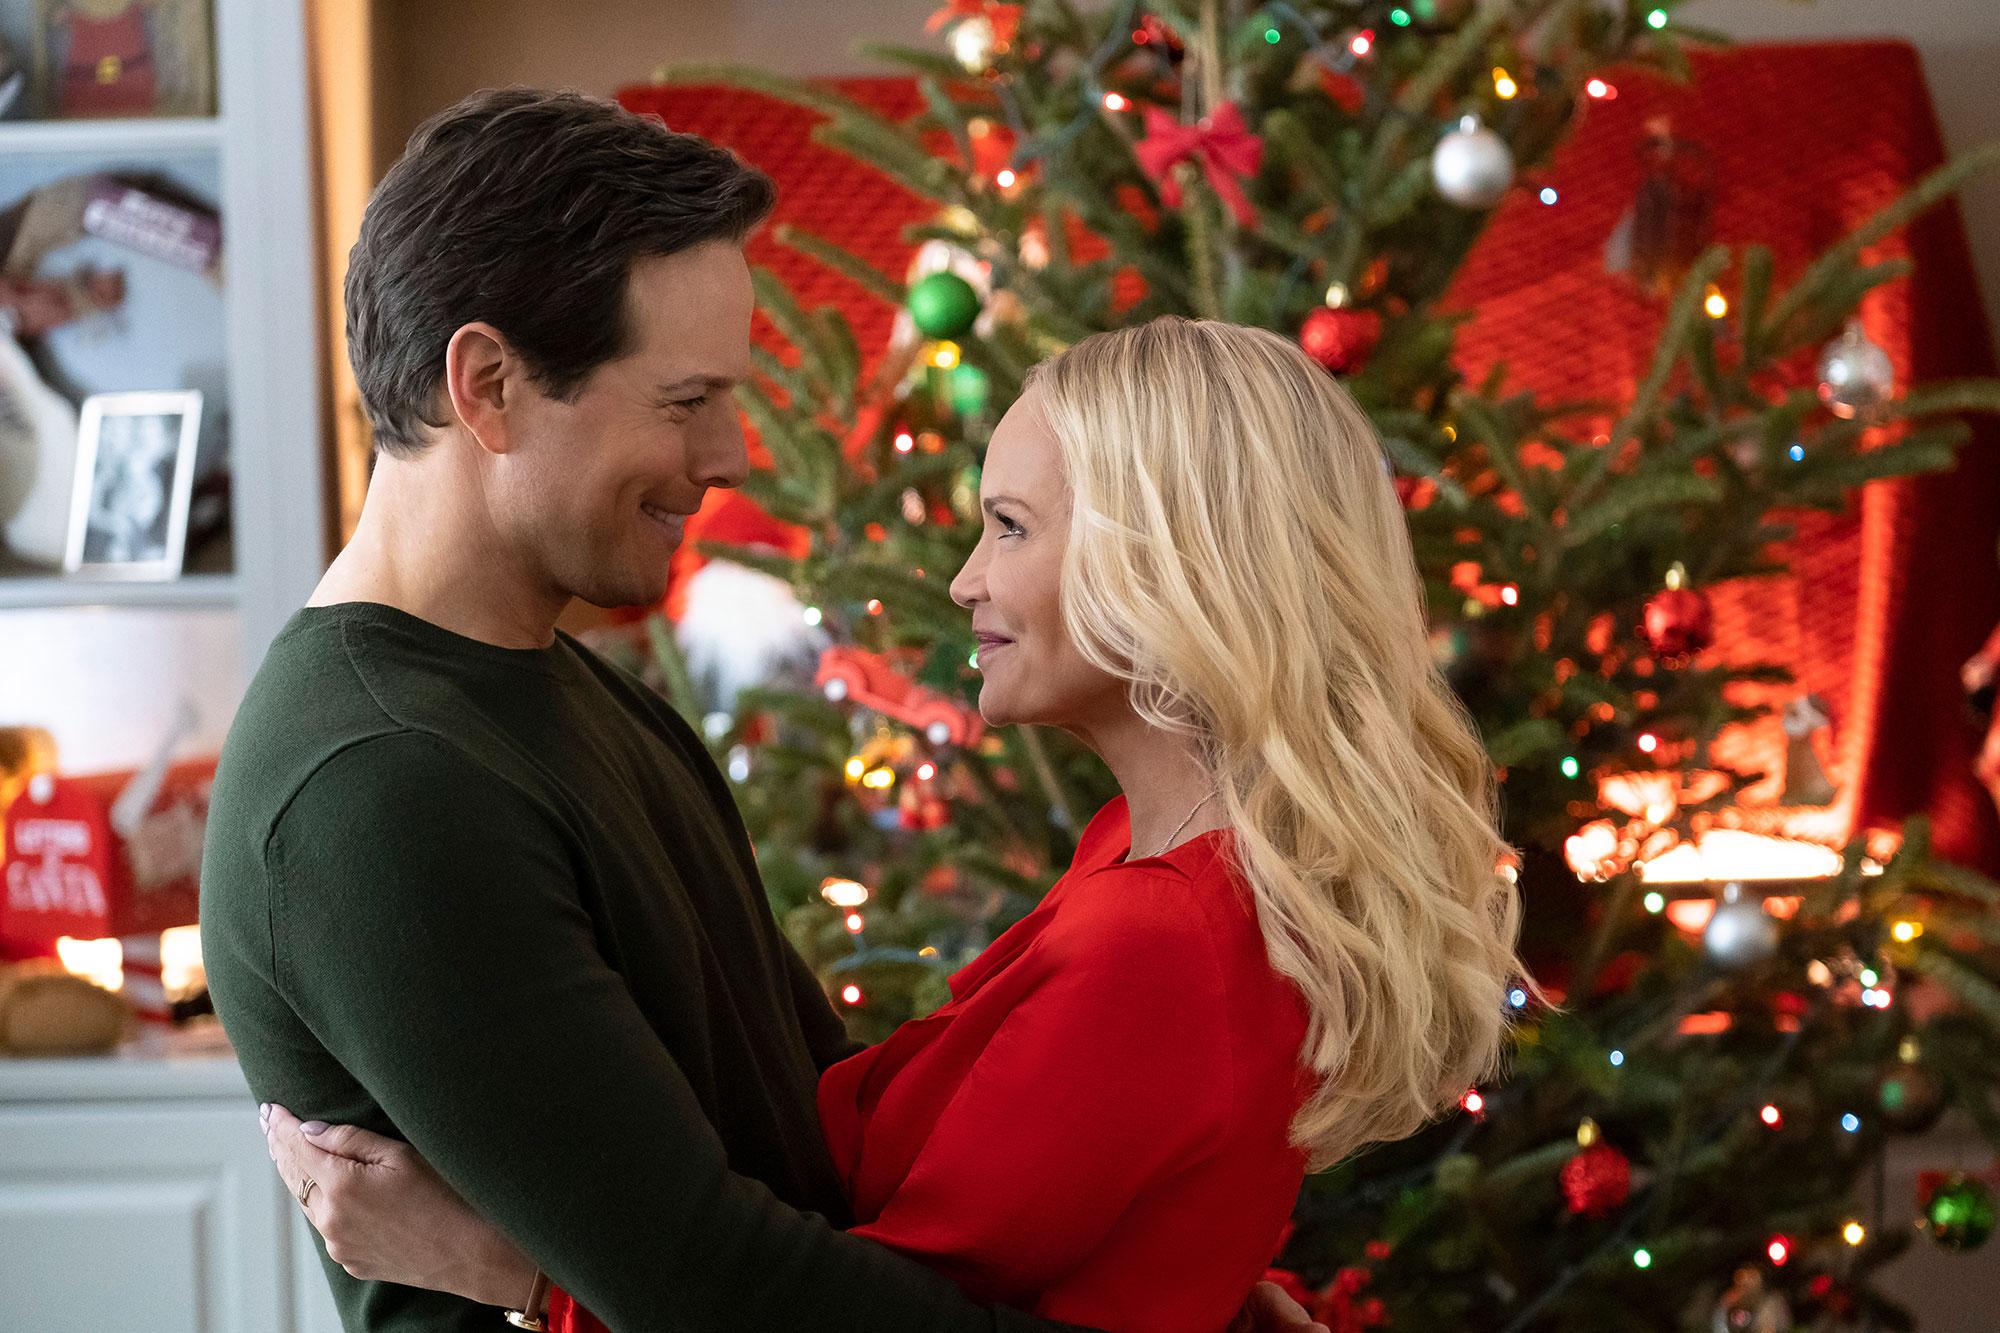 Come in un film di Natale (2019) – A Christmas Movie Christmas